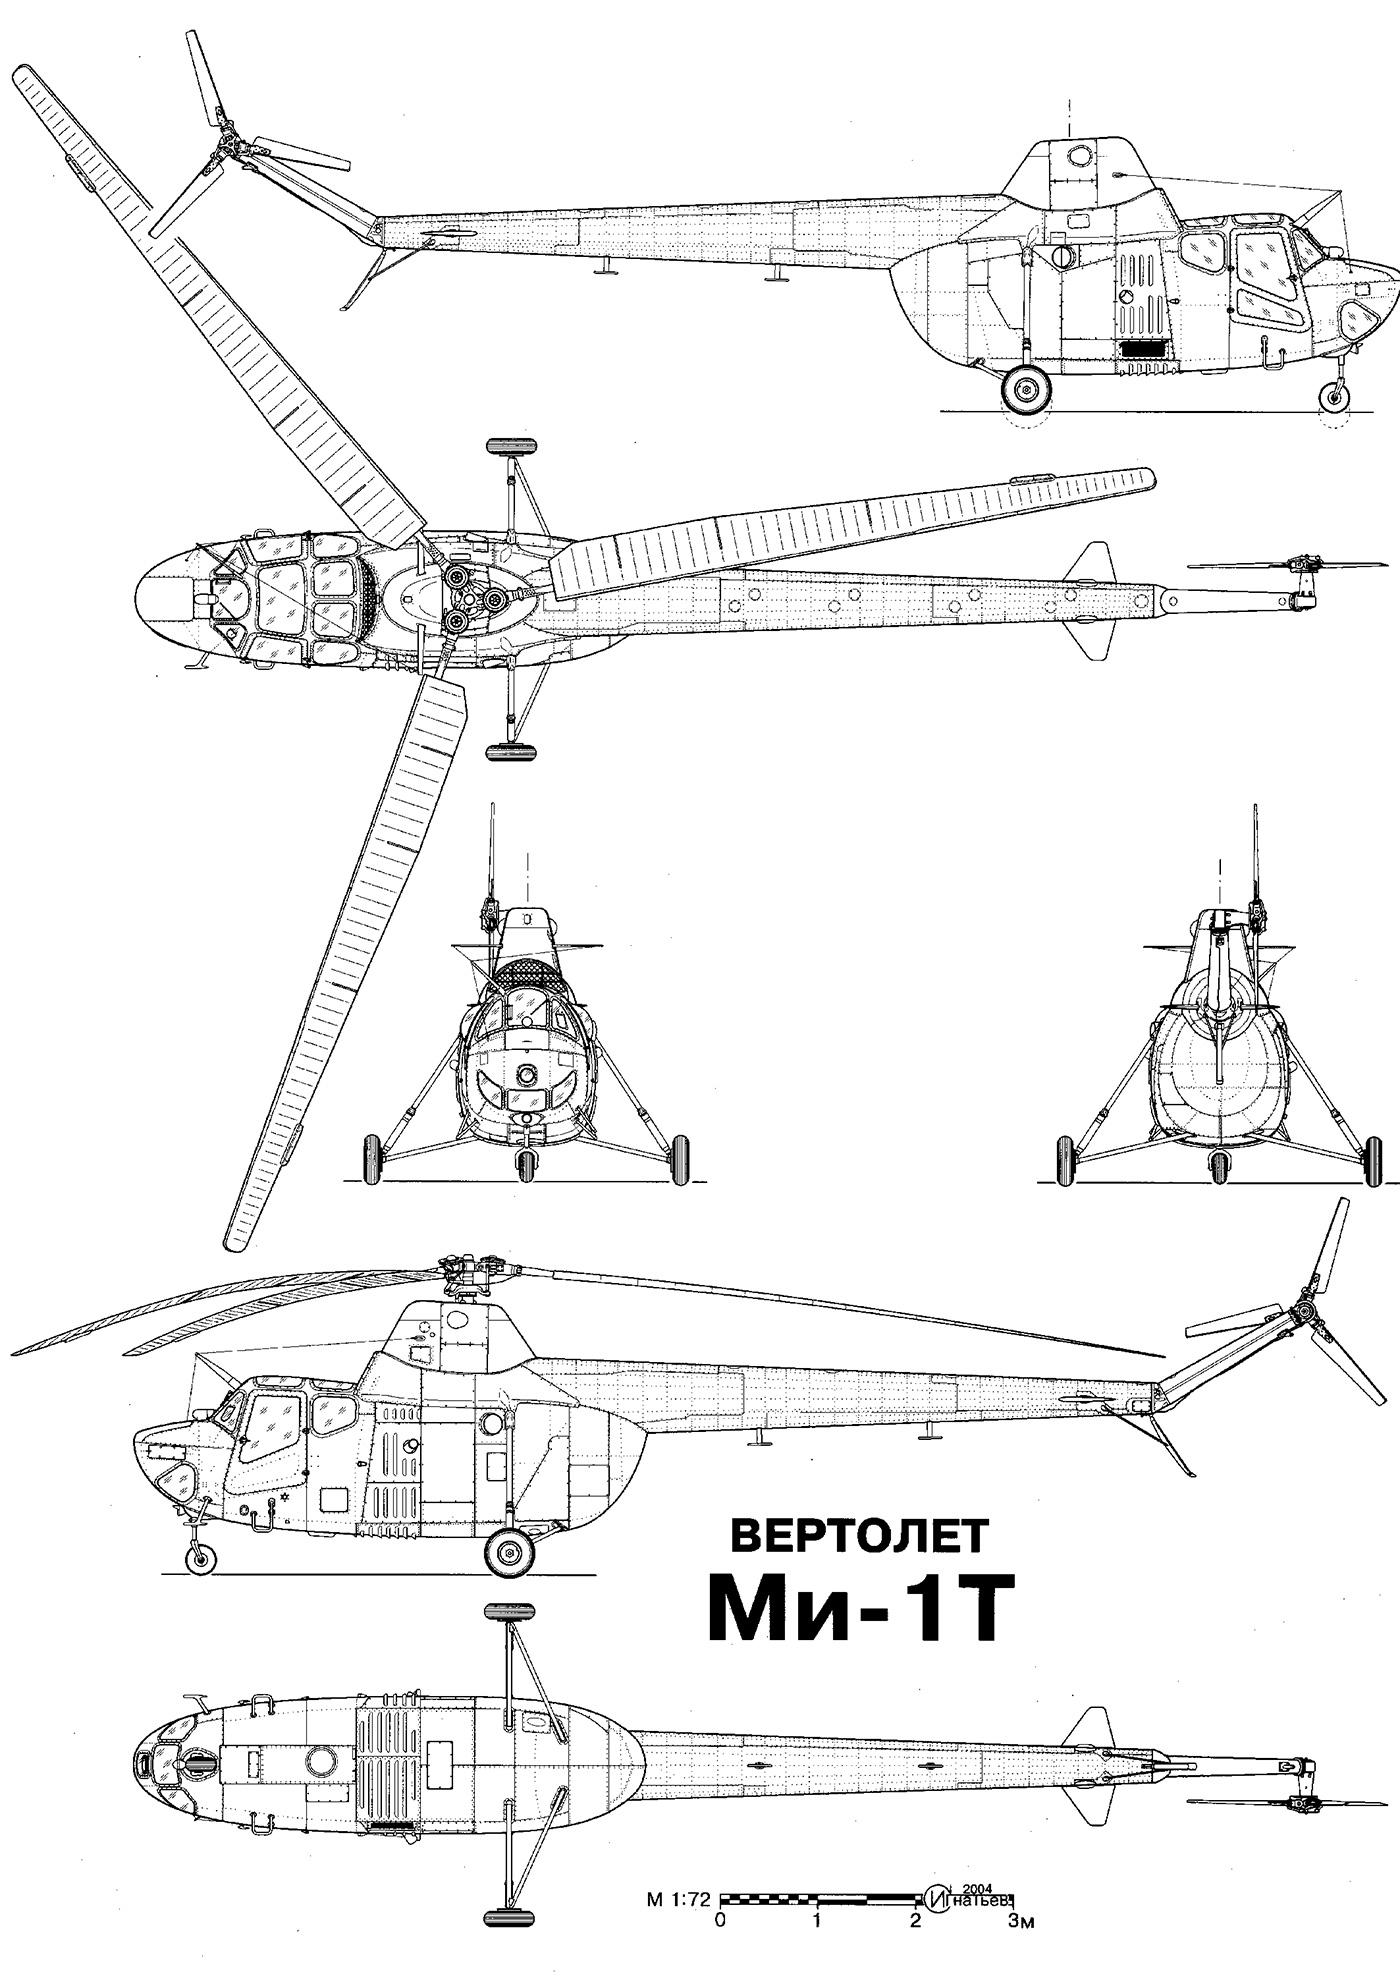 Чертеж многоцелевого вертолета Ми-1Т